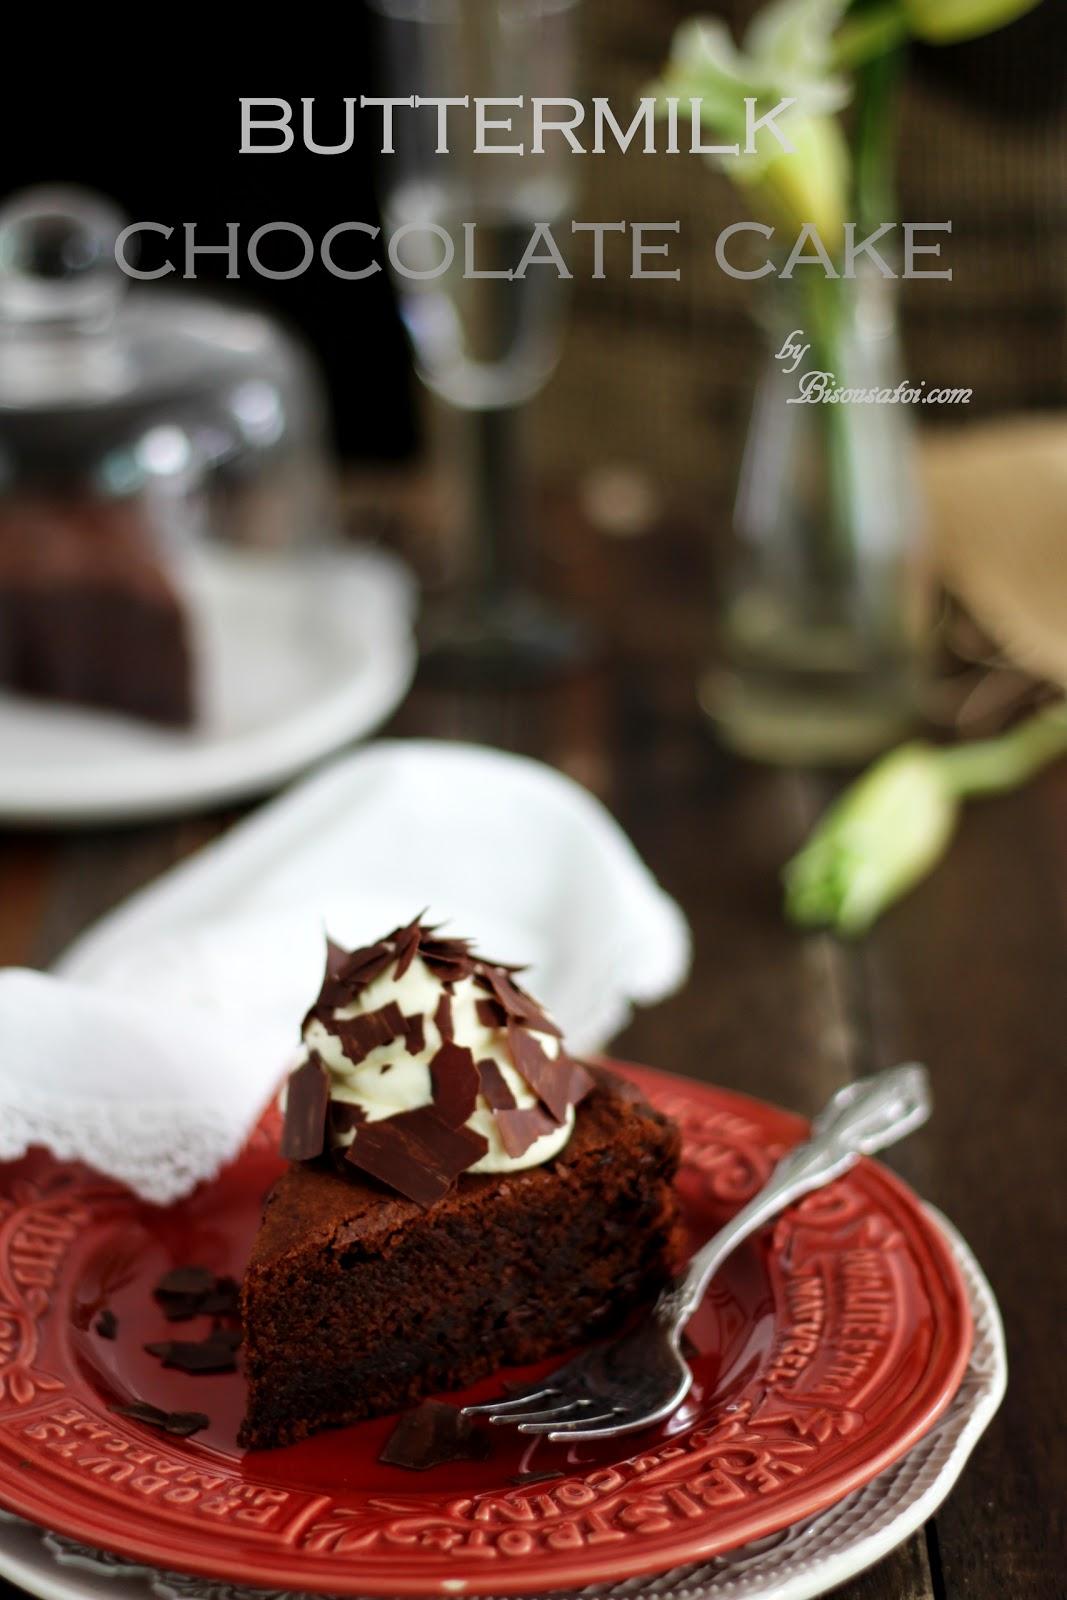 Tish Boyle Buttermilk Chocolate Cake